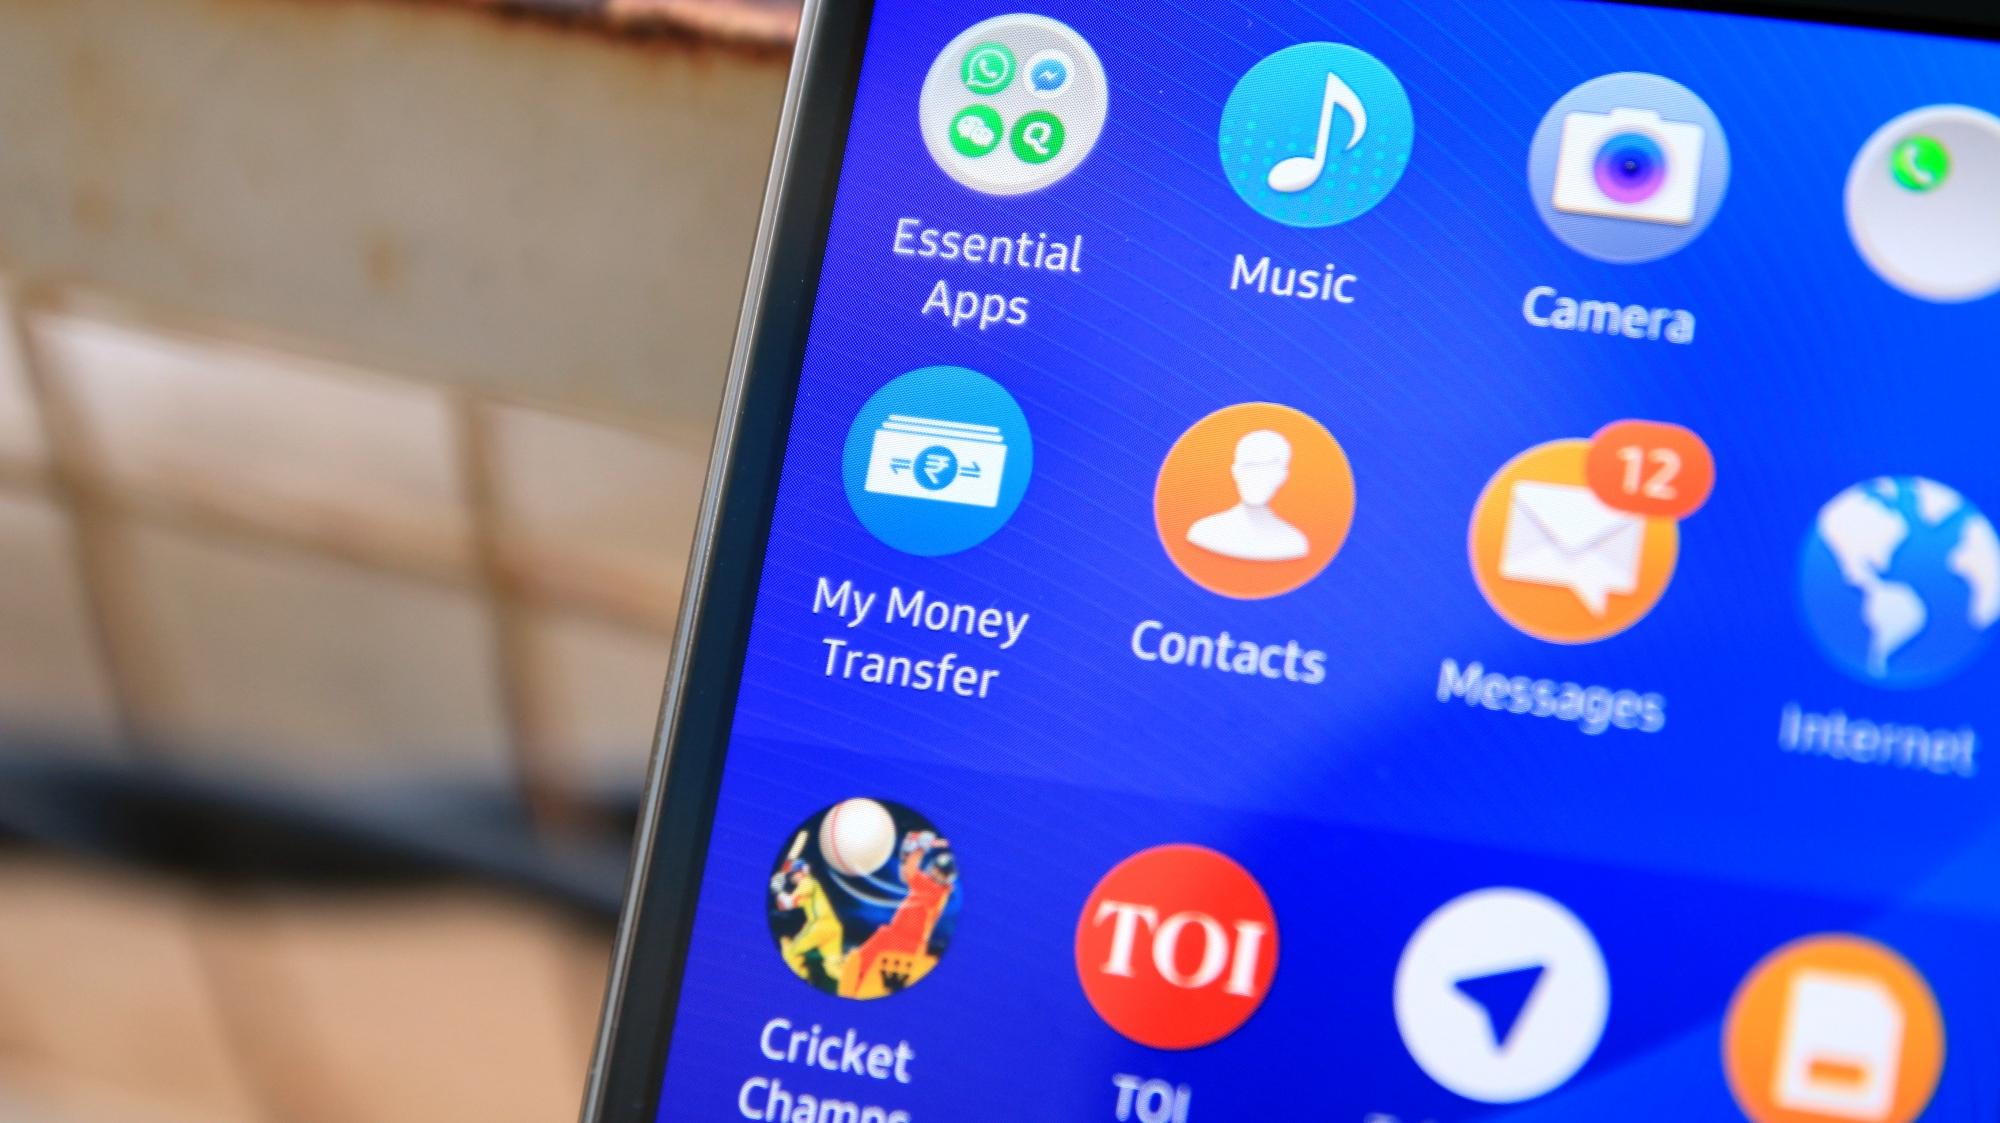 My Money Transfer app released for the Samsung Z1 and Z3 - SamMobile